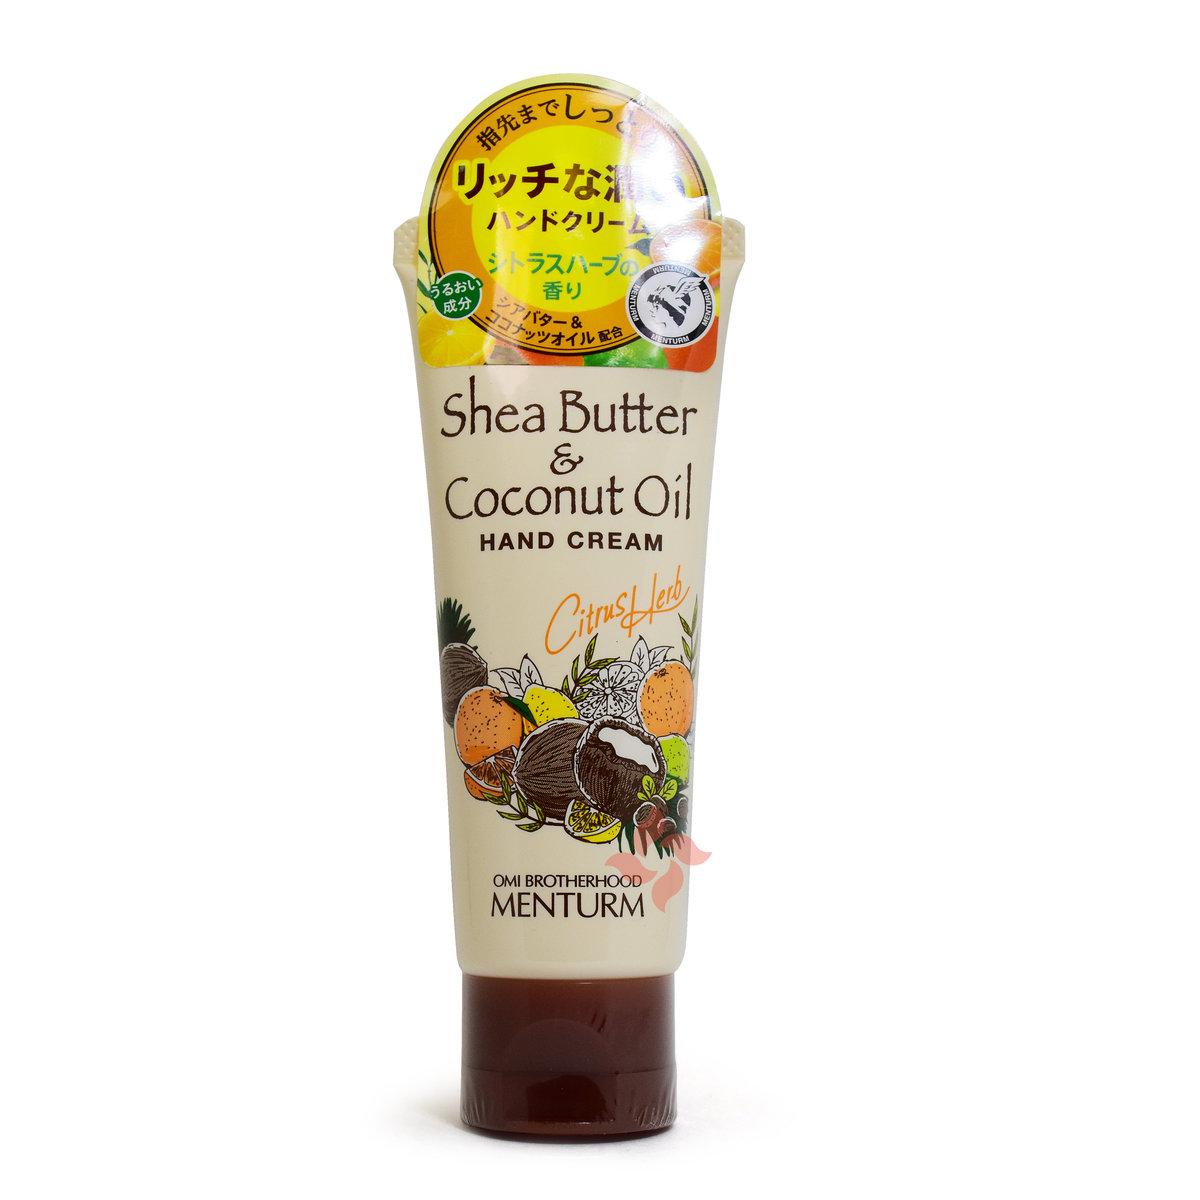 Menturm Shea Butter & Coconut Oil Hand Cream (Citrus Herb Moist) 75g (4987036456727)